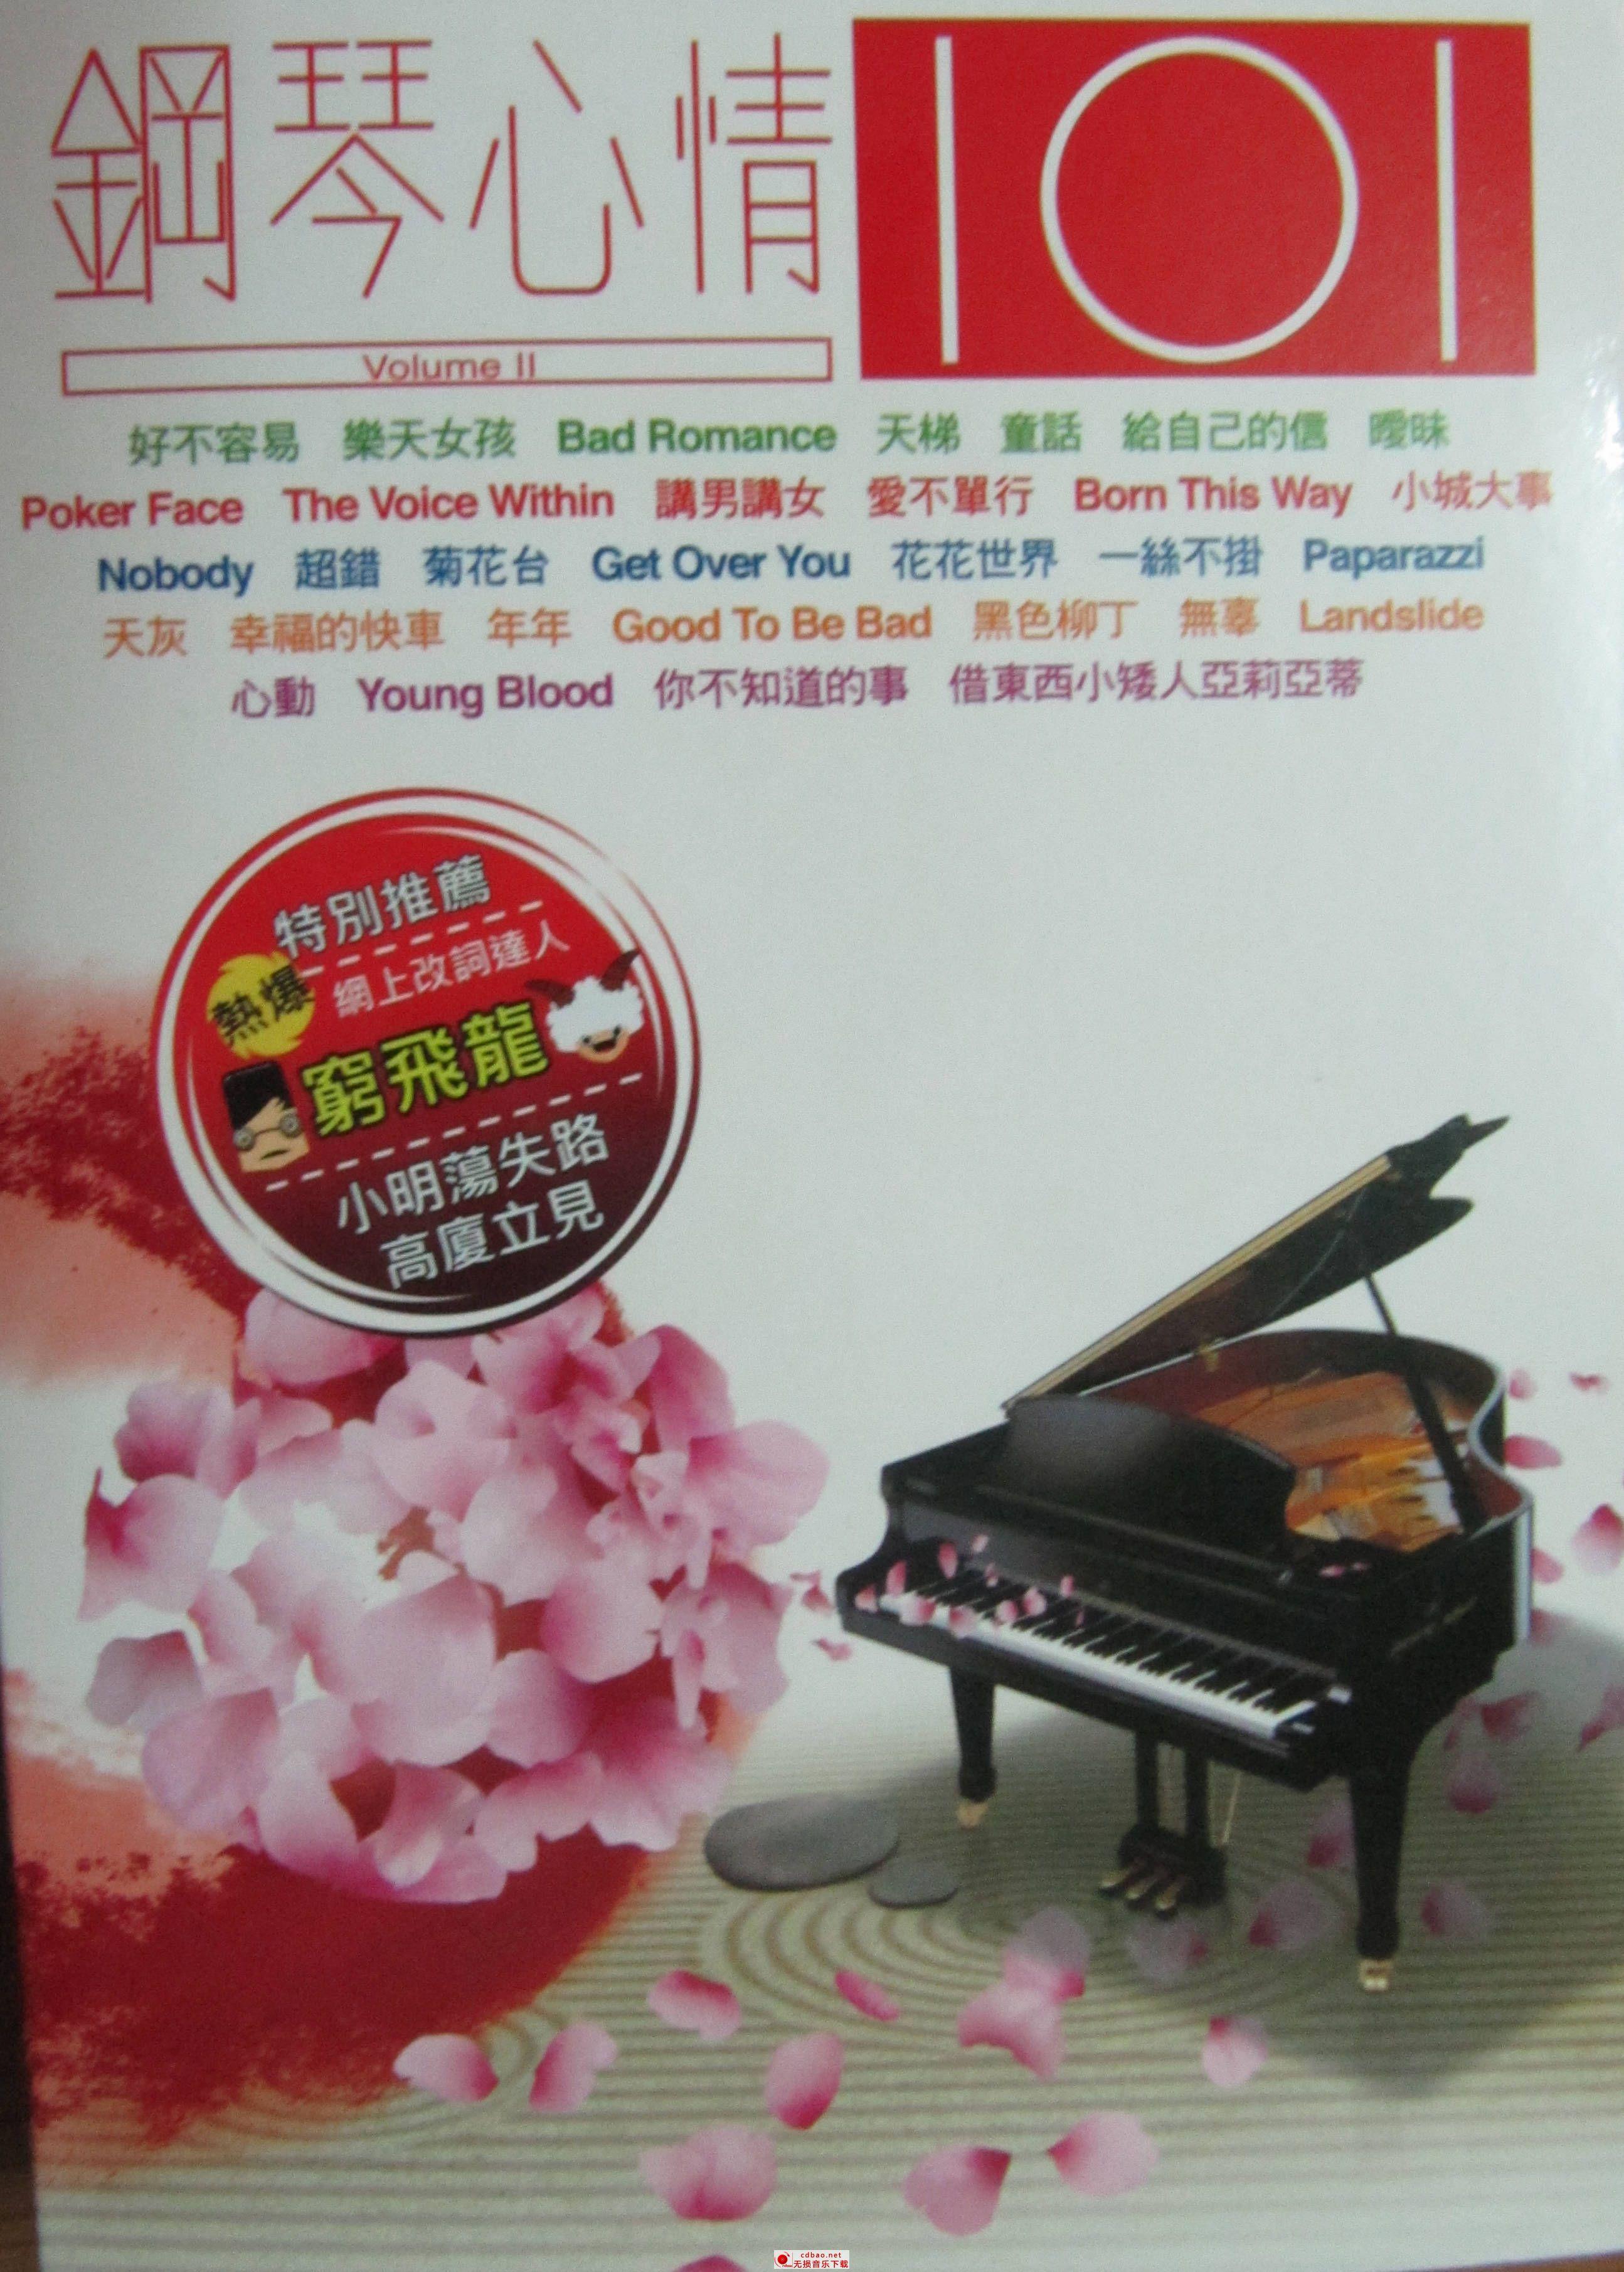 dimalam推荐 《钢琴心情101 Volume2》6CD [ape分轨][旋风]